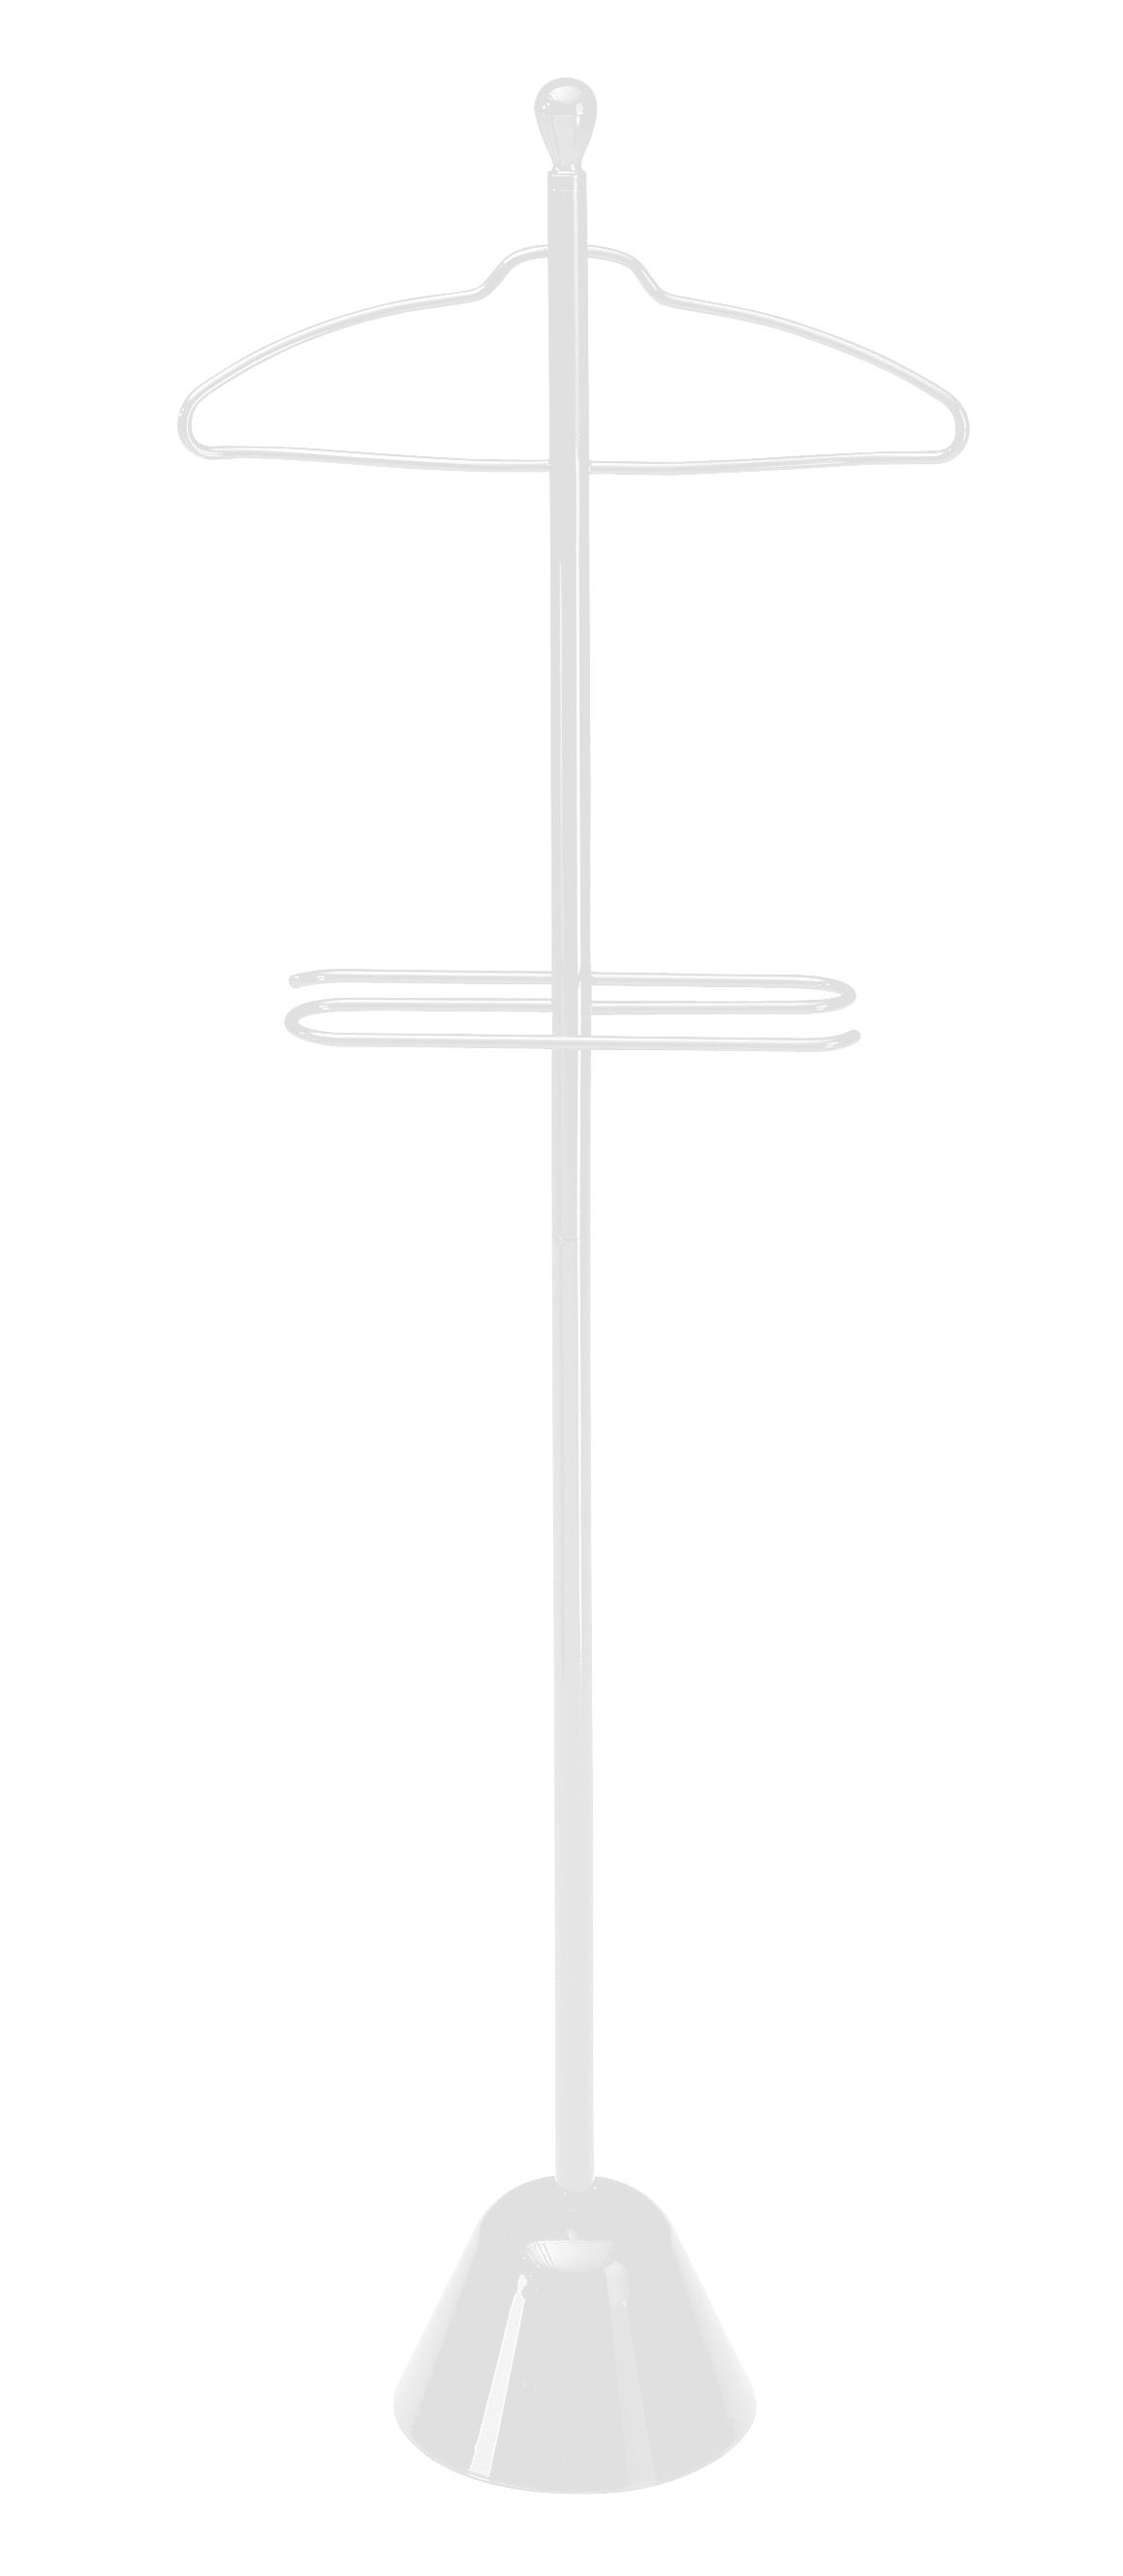 Furniture - Miscellaneous furniture - Servonotte Valet by Zanotta - White - Varnished steel